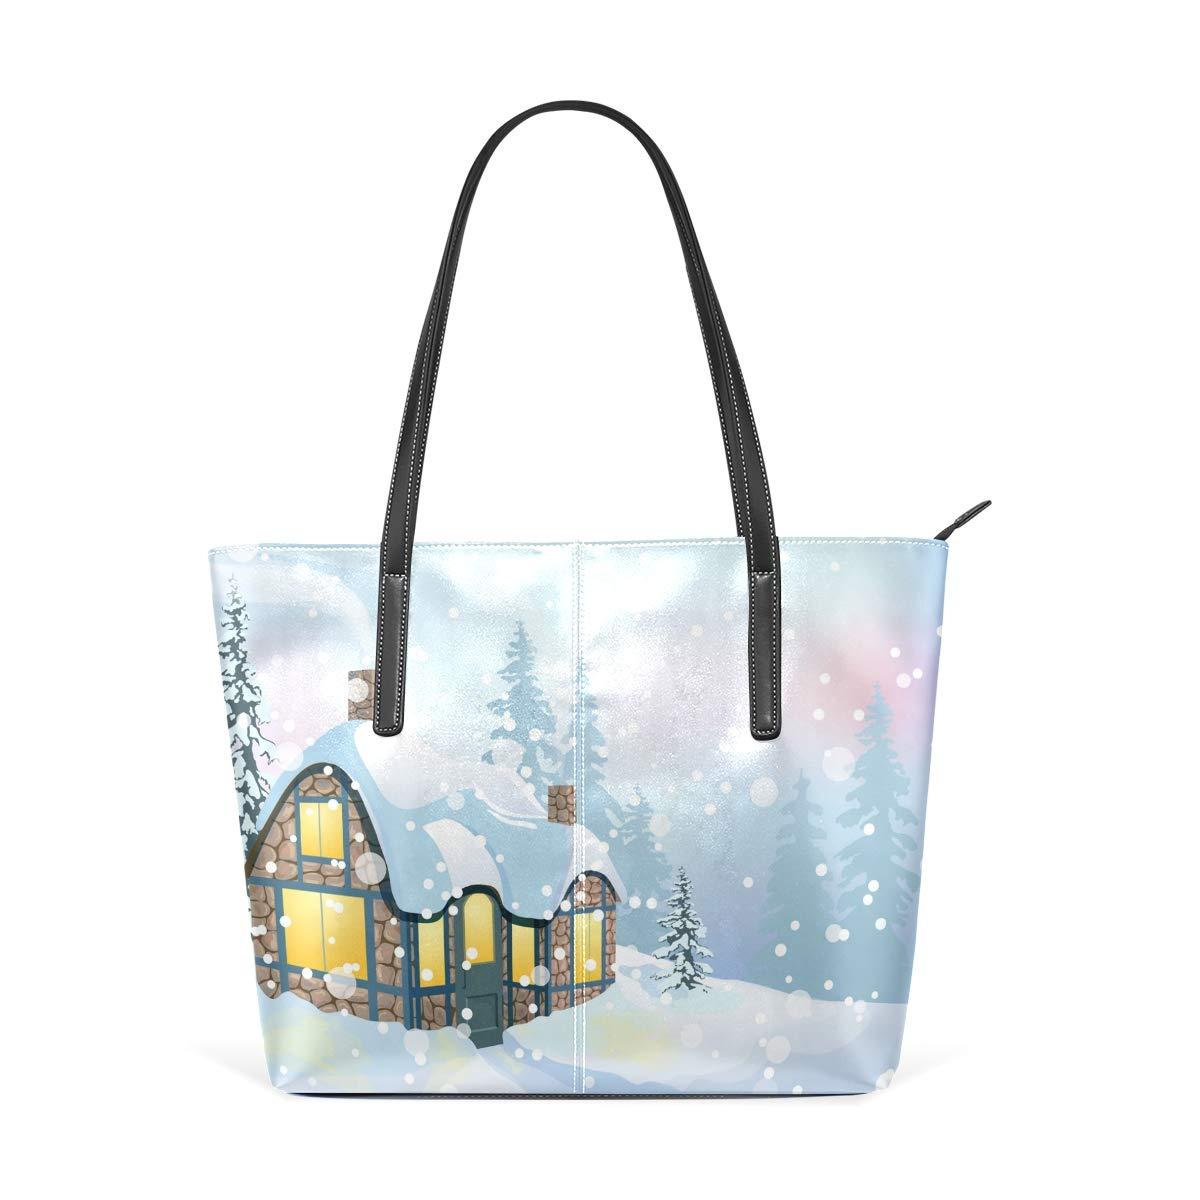 AMONKA , Damen Tote-Tasche Mehrfarbig mehrfarbig Large B07PXY1VJQ Shopper Günstige Bestellung